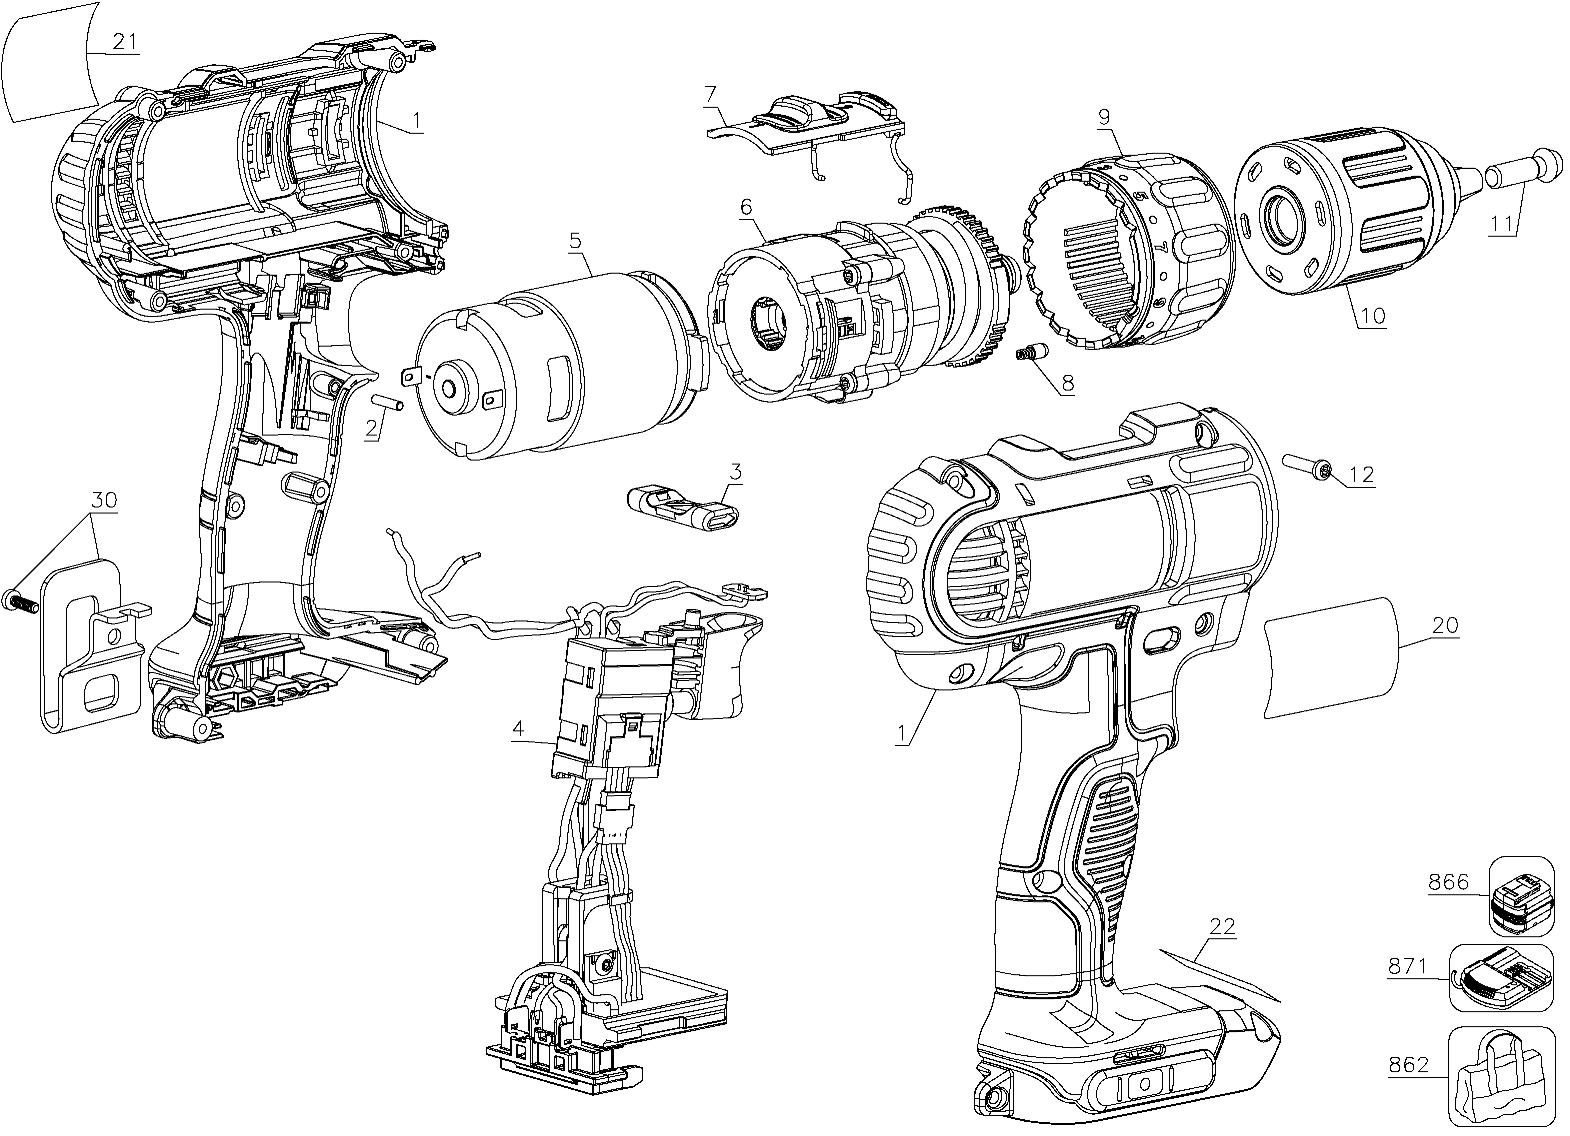 dewalt dcd771c2 parts